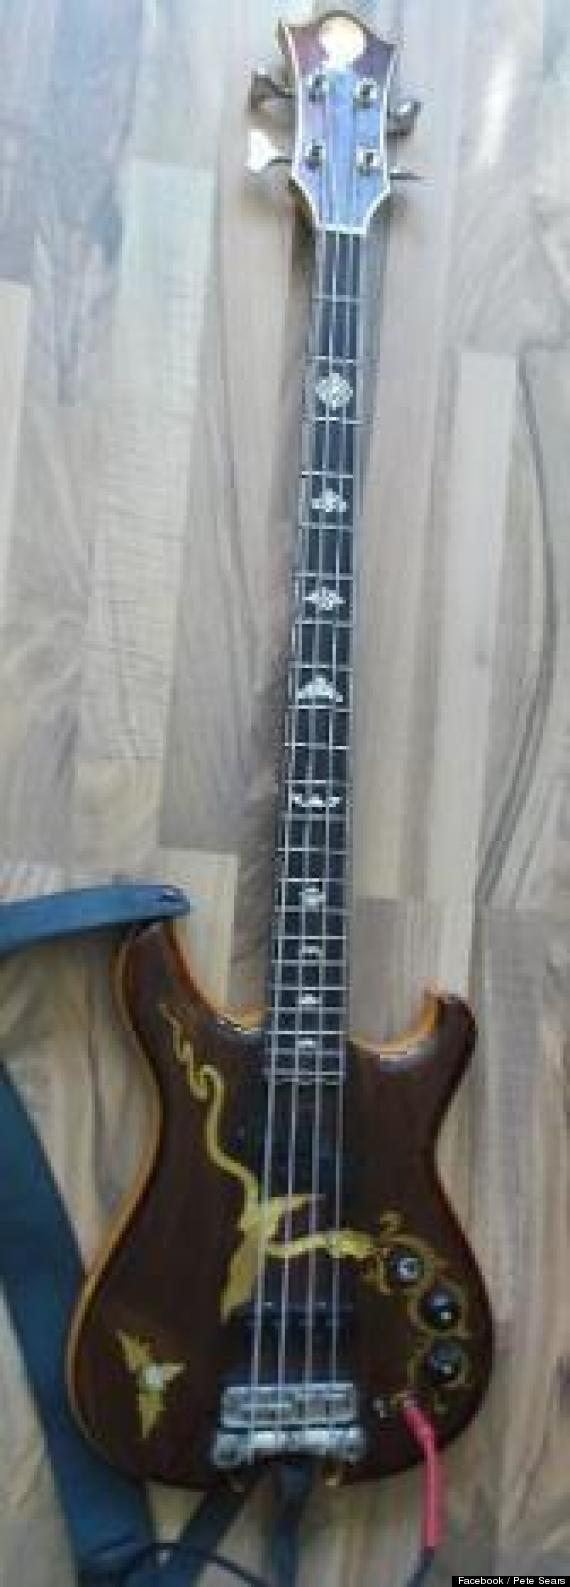 pete sears bass guitar